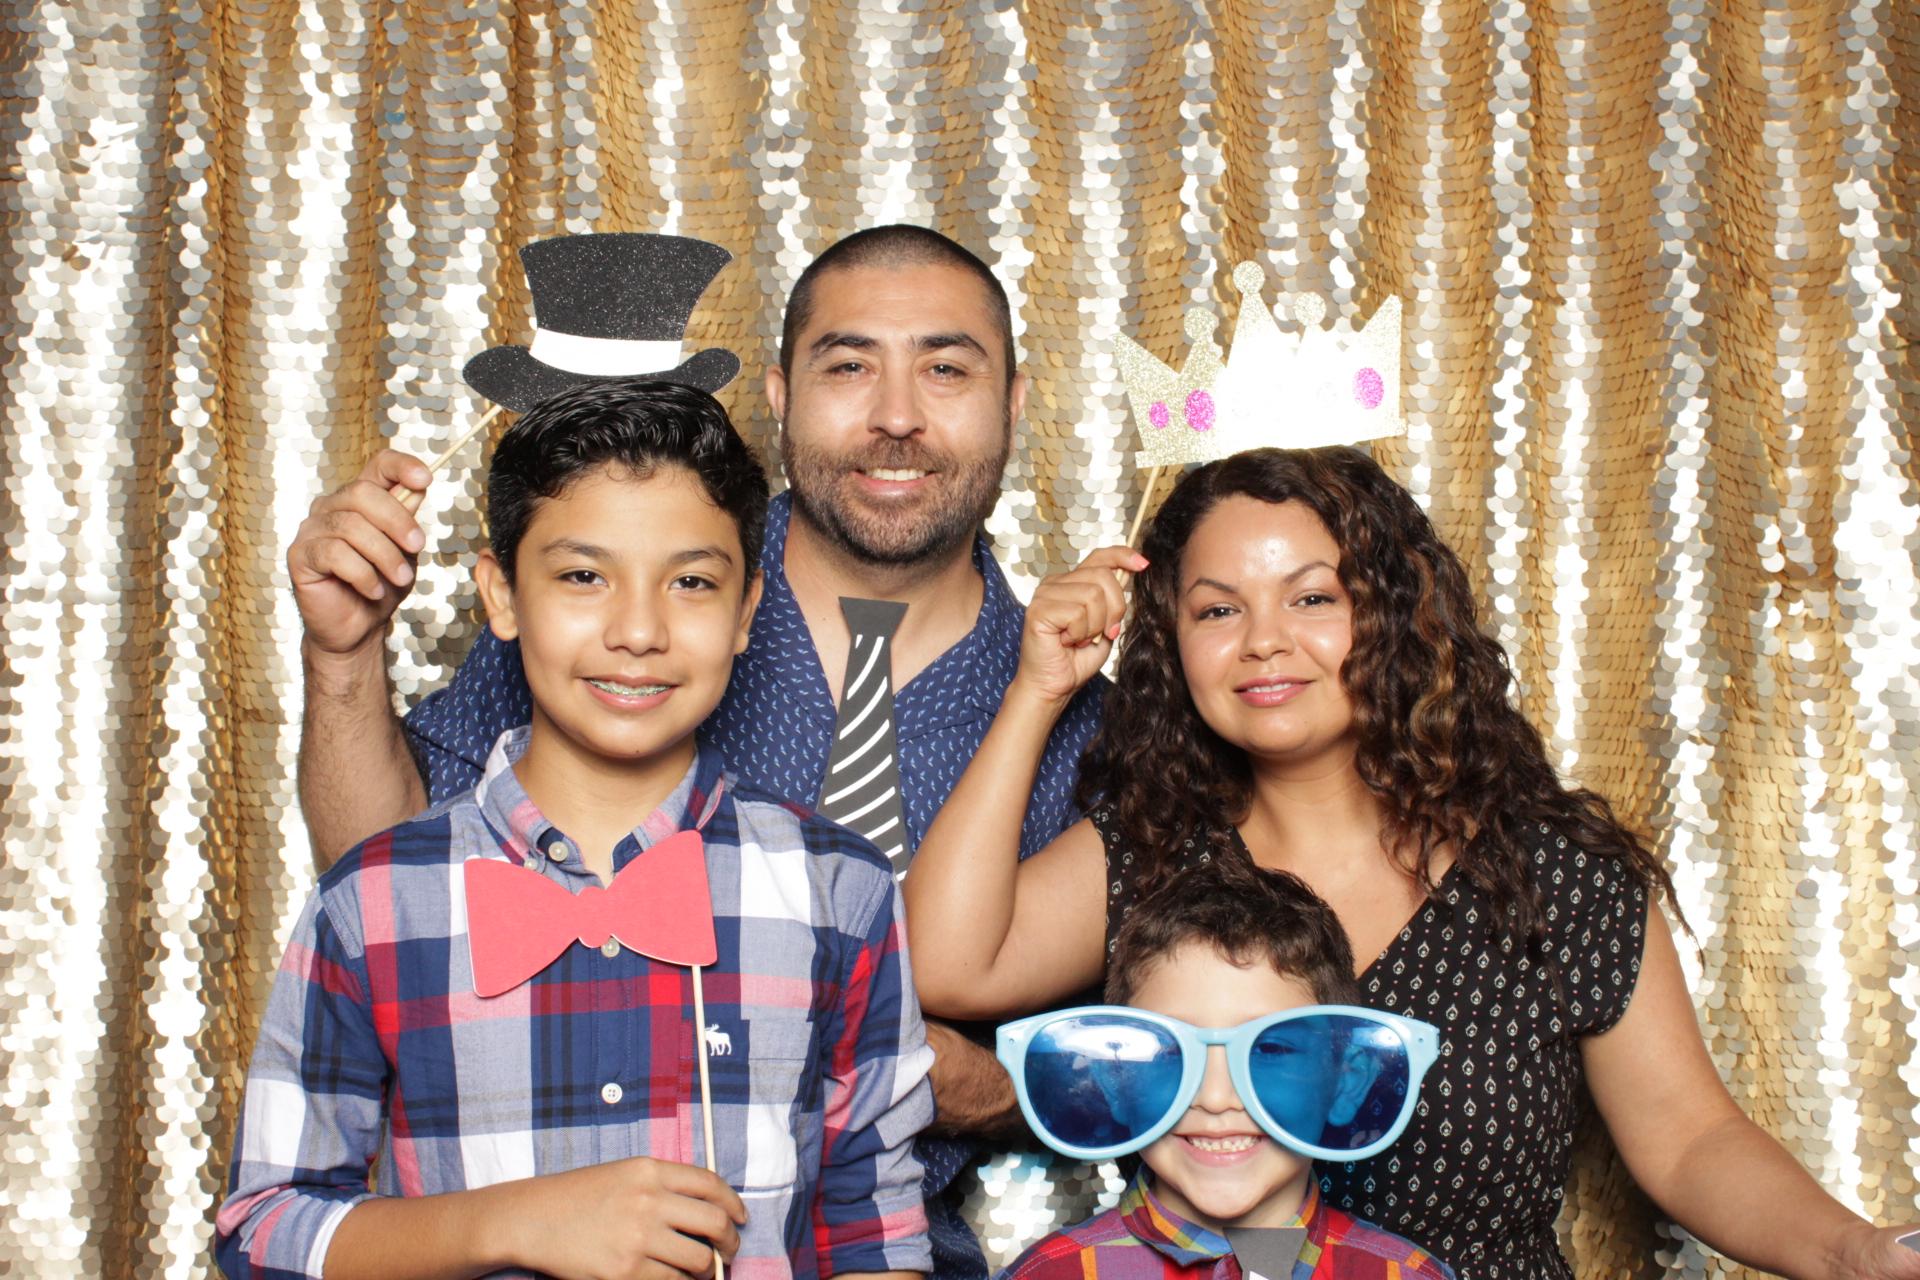 Stephen's 40th Birthday Party - Sandbar Mexican Grill, Chandler, AZ10/13/2018